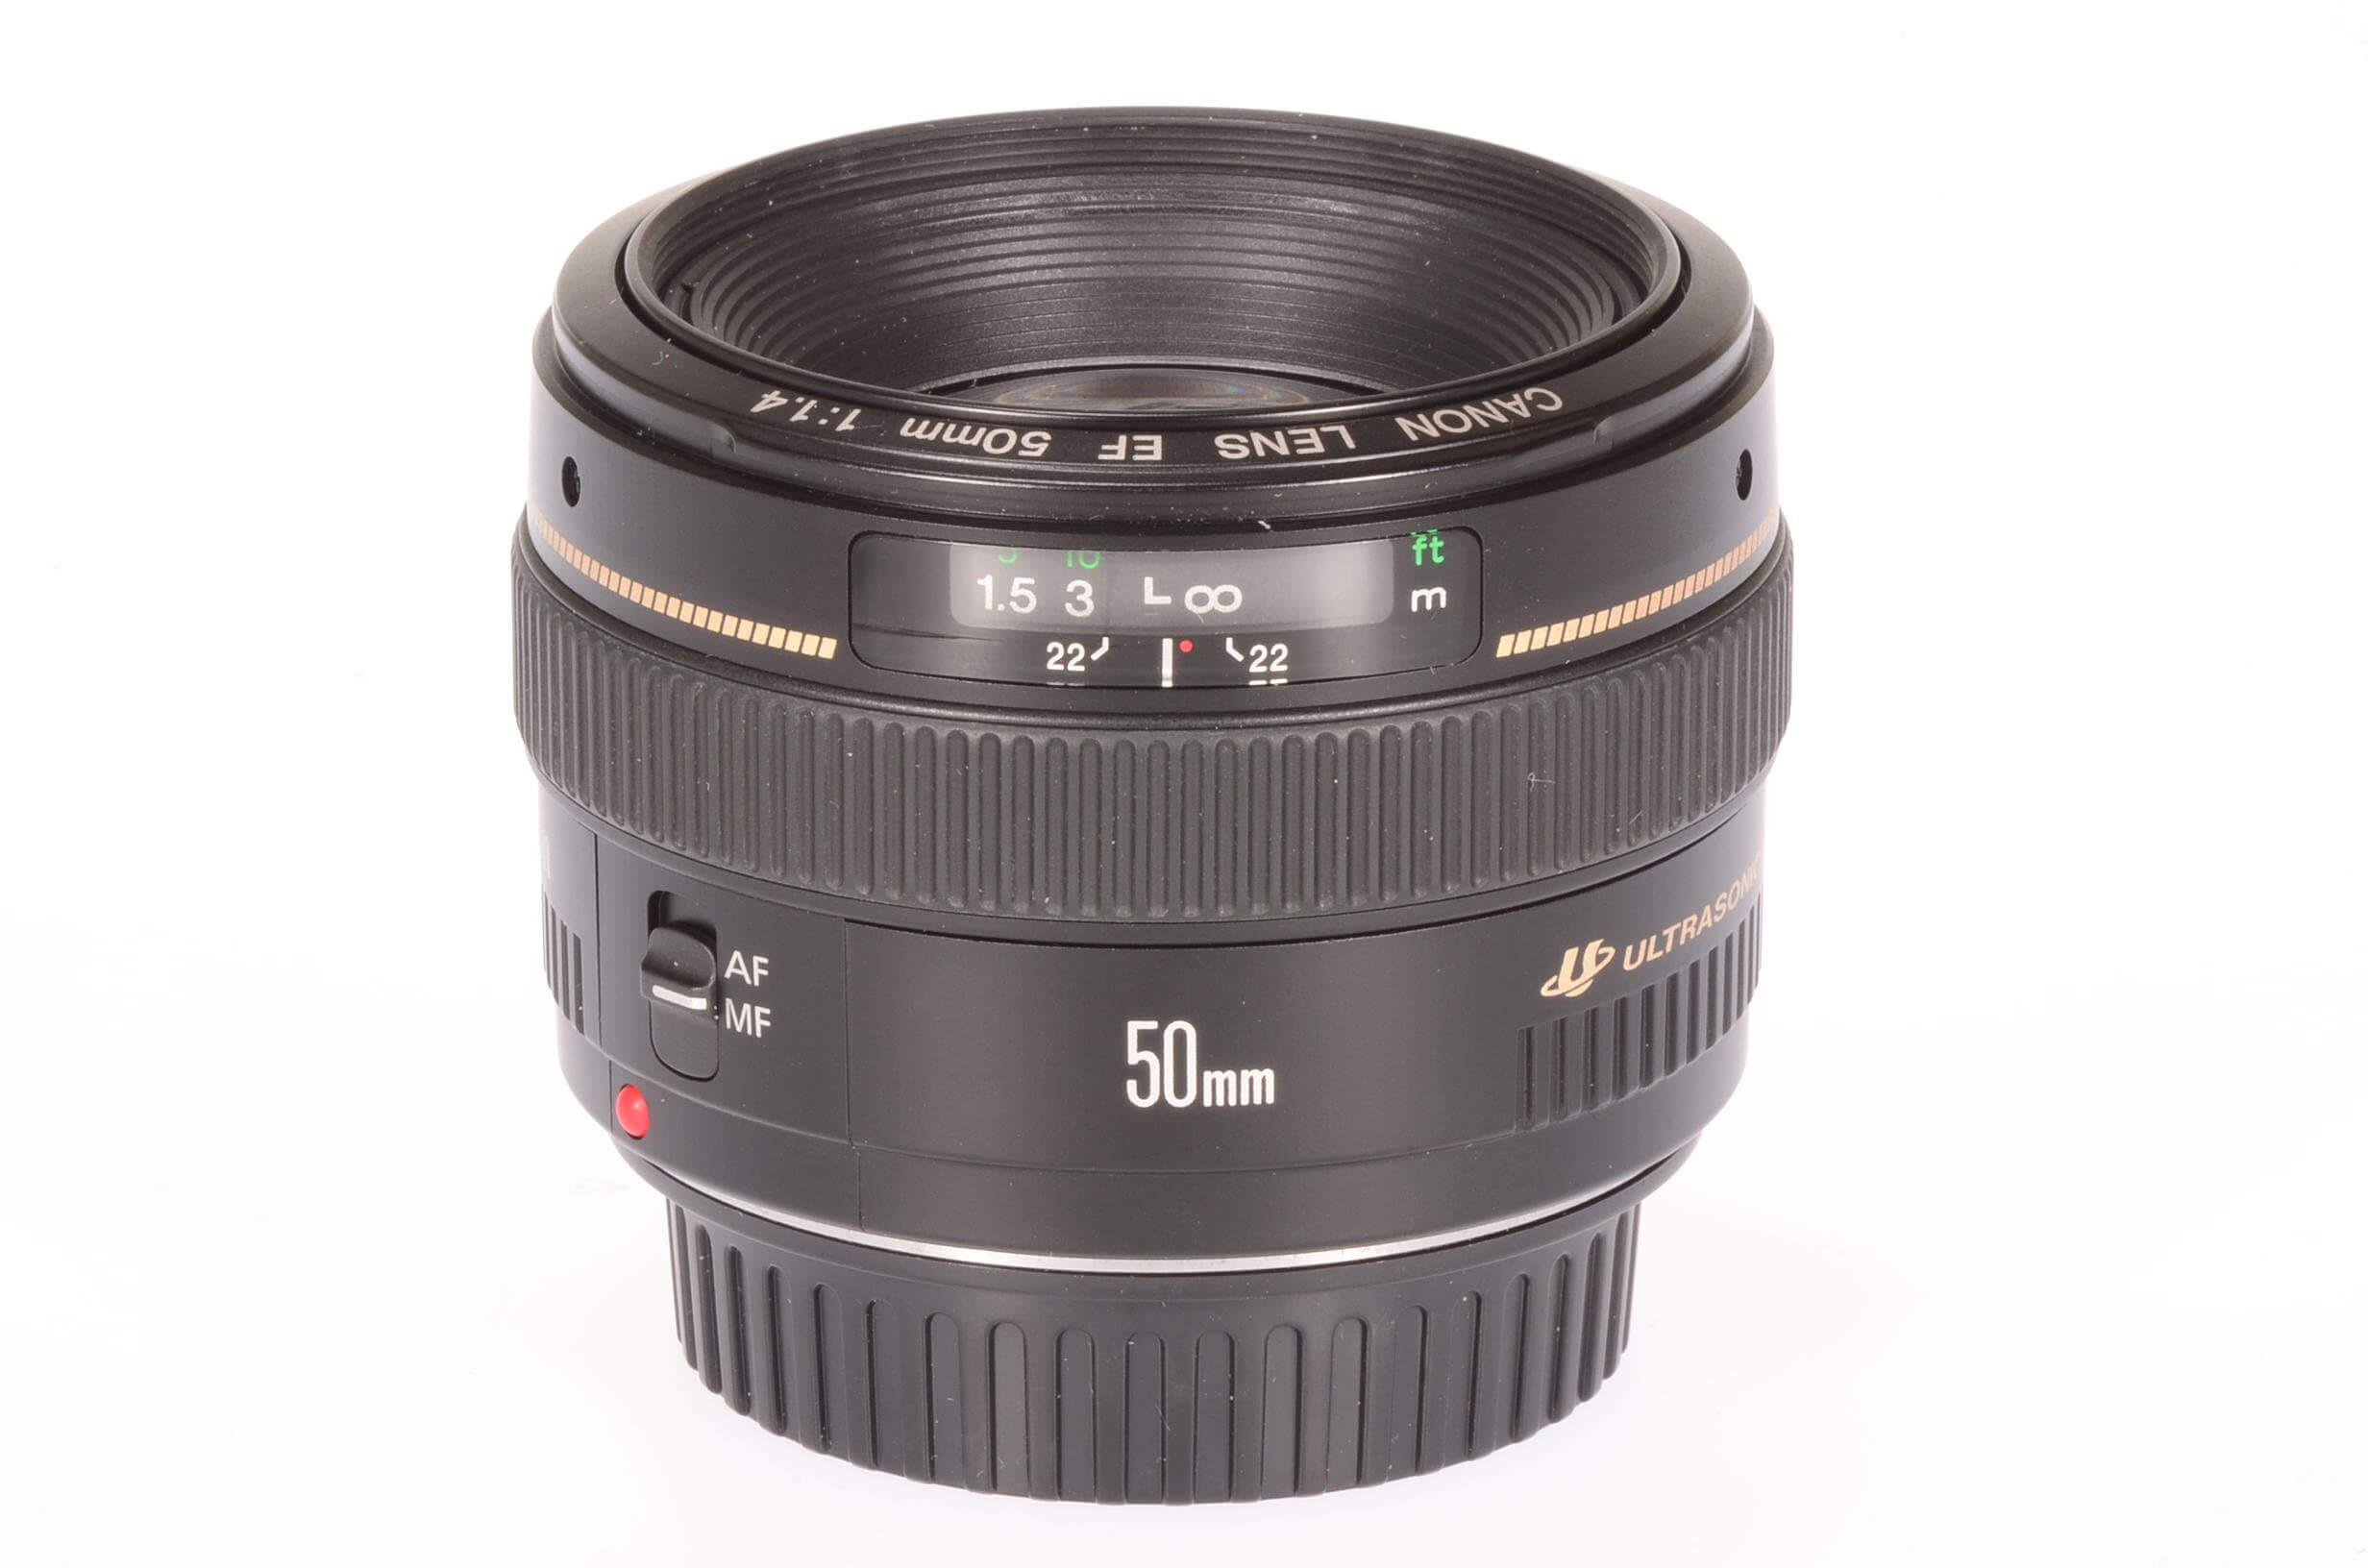 Canon 50mm f1.4 USM lens, mint!